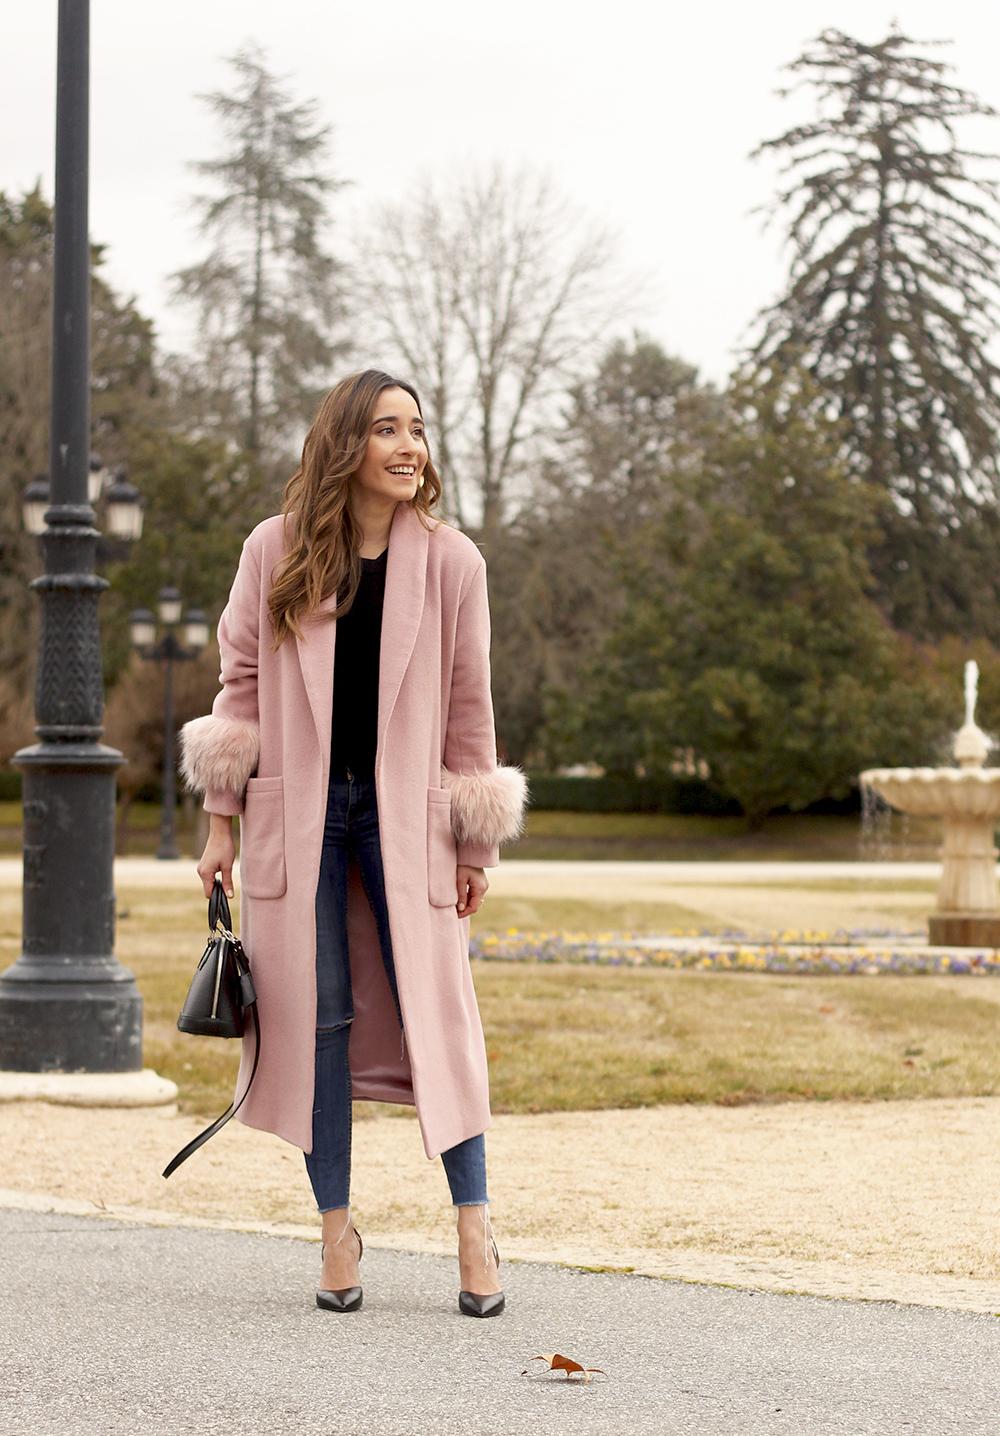 pink coat byleclair carolina herrera heels jeans louis vuitton ba street style outfit 20192